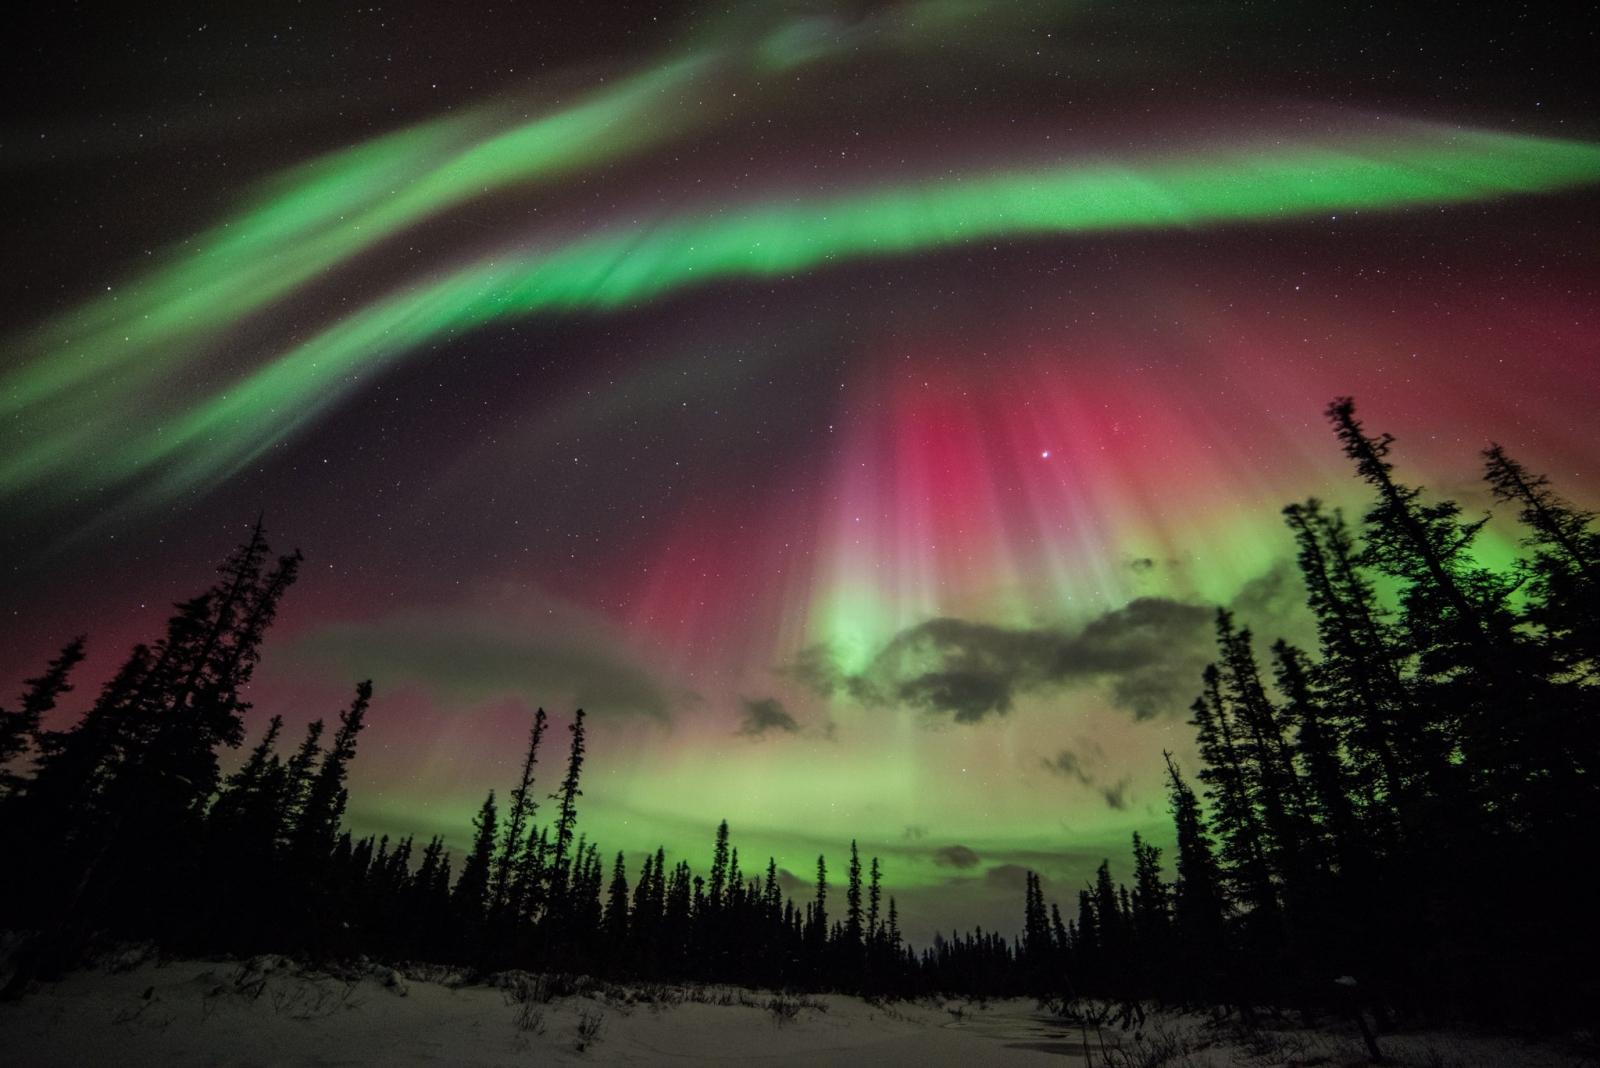 nasa northern lights forecast 2017 - photo #23